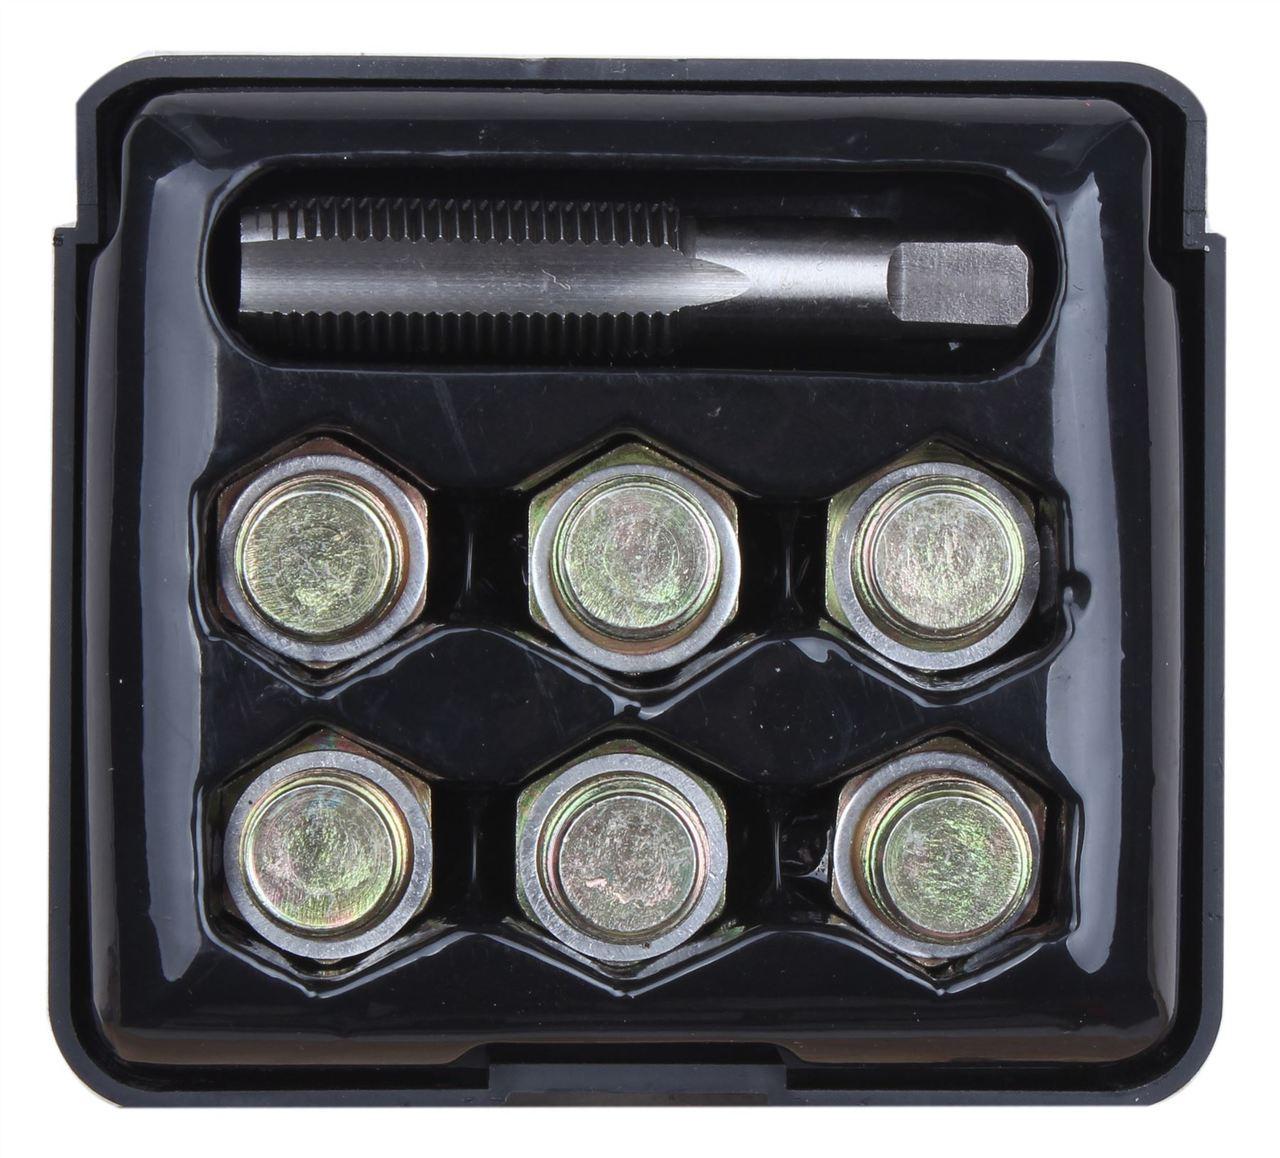 Oil Sump Plug Pan Thread Repair Kit Set M18 Re-taps To M20 18mm to 20mm